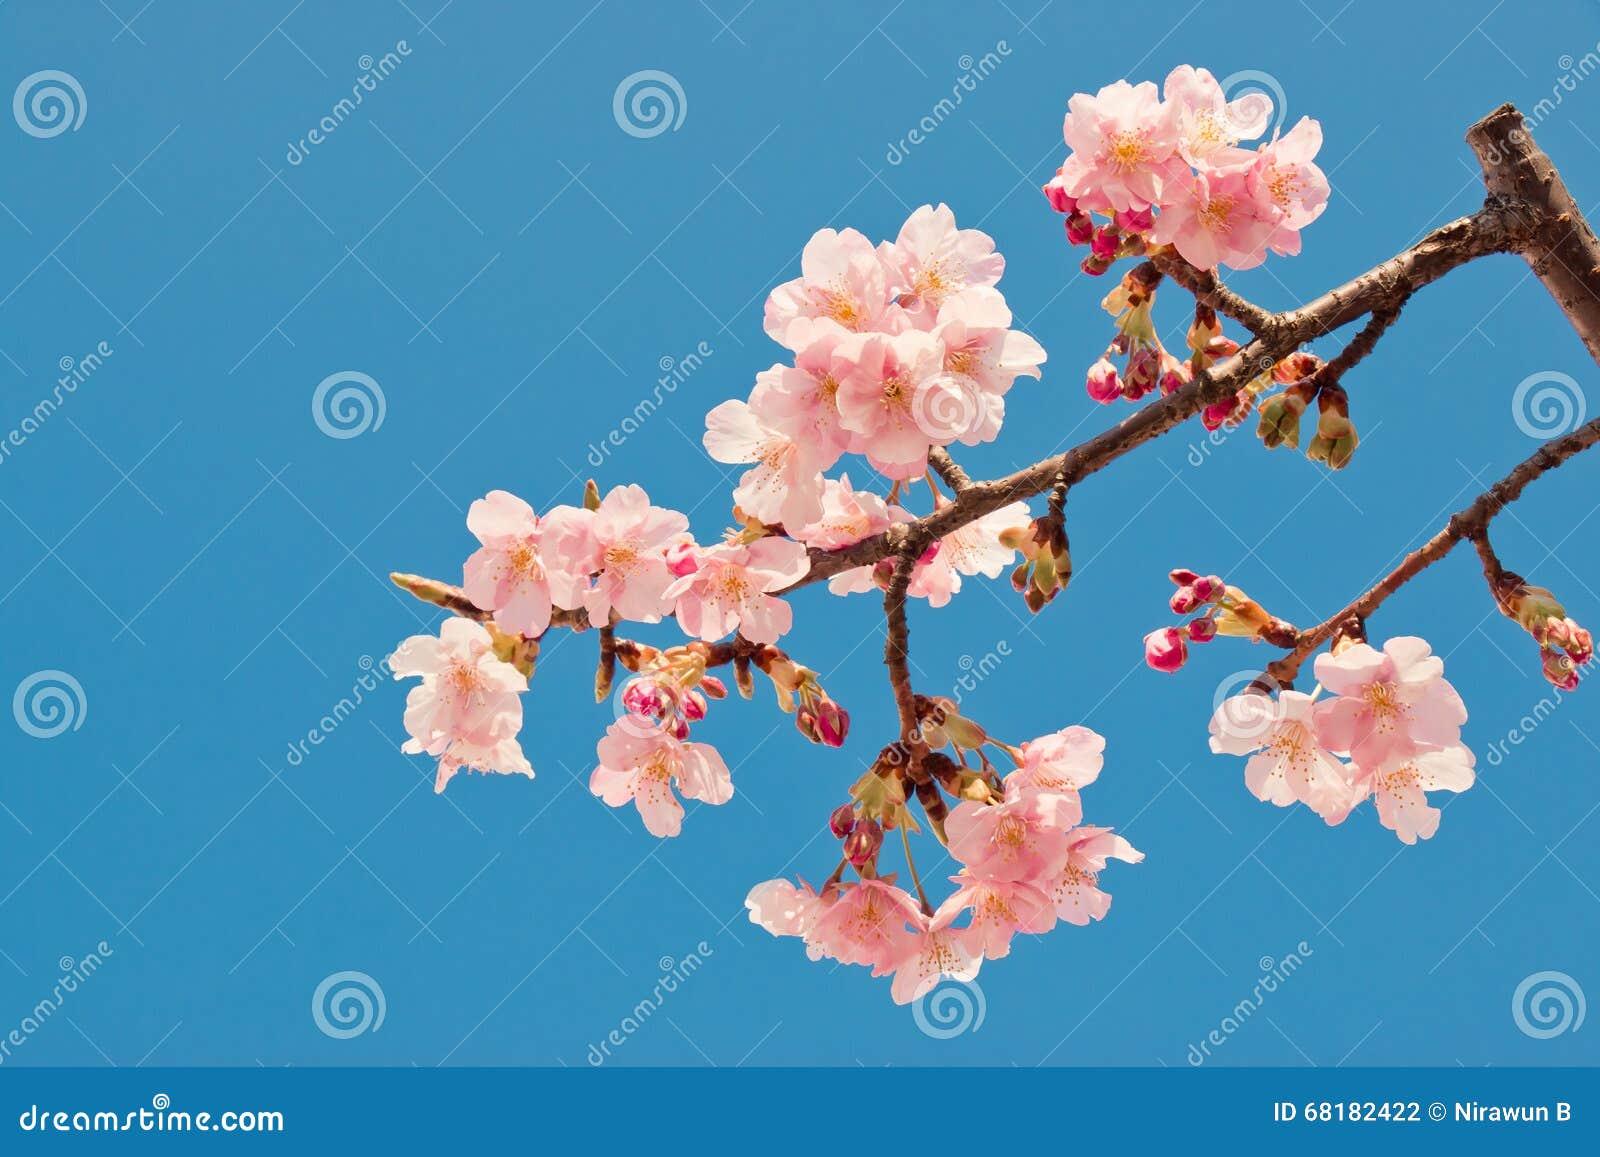 Pink sakura cherry blossom is the most beautiful flower stock royalty free stock photo izmirmasajfo Gallery